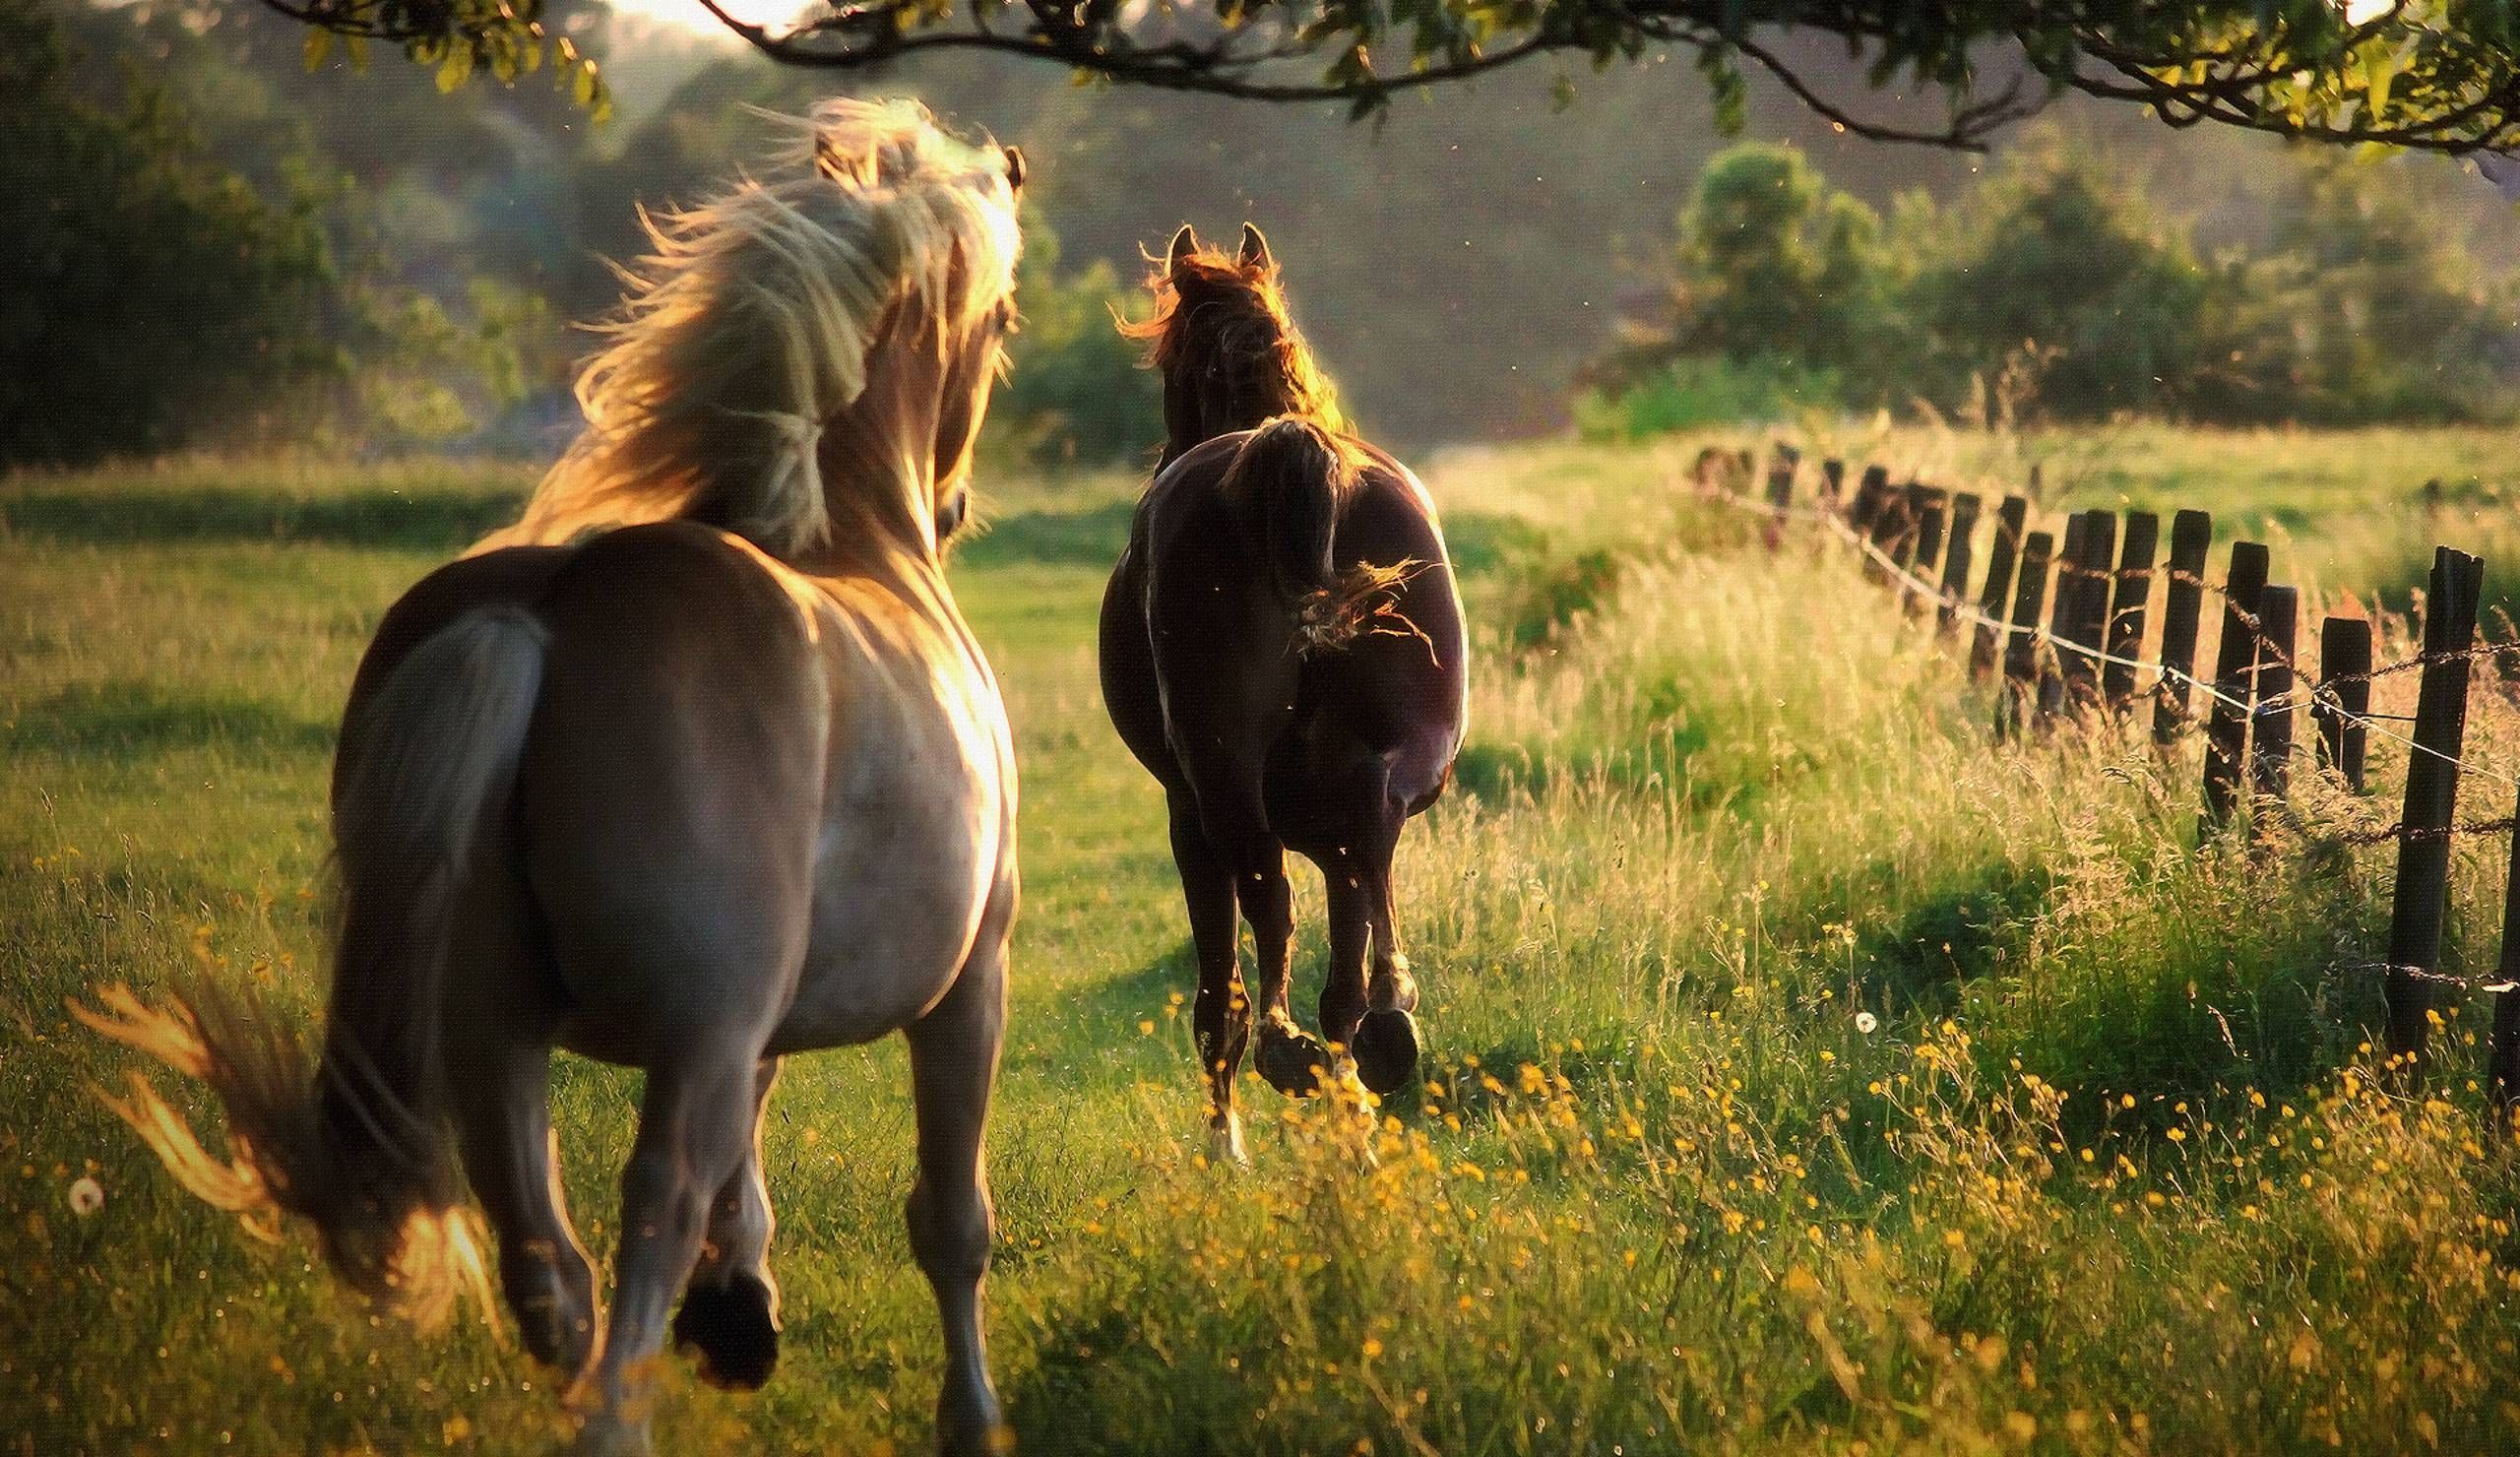 Wild Horses Wallpapers - Top Free Wild